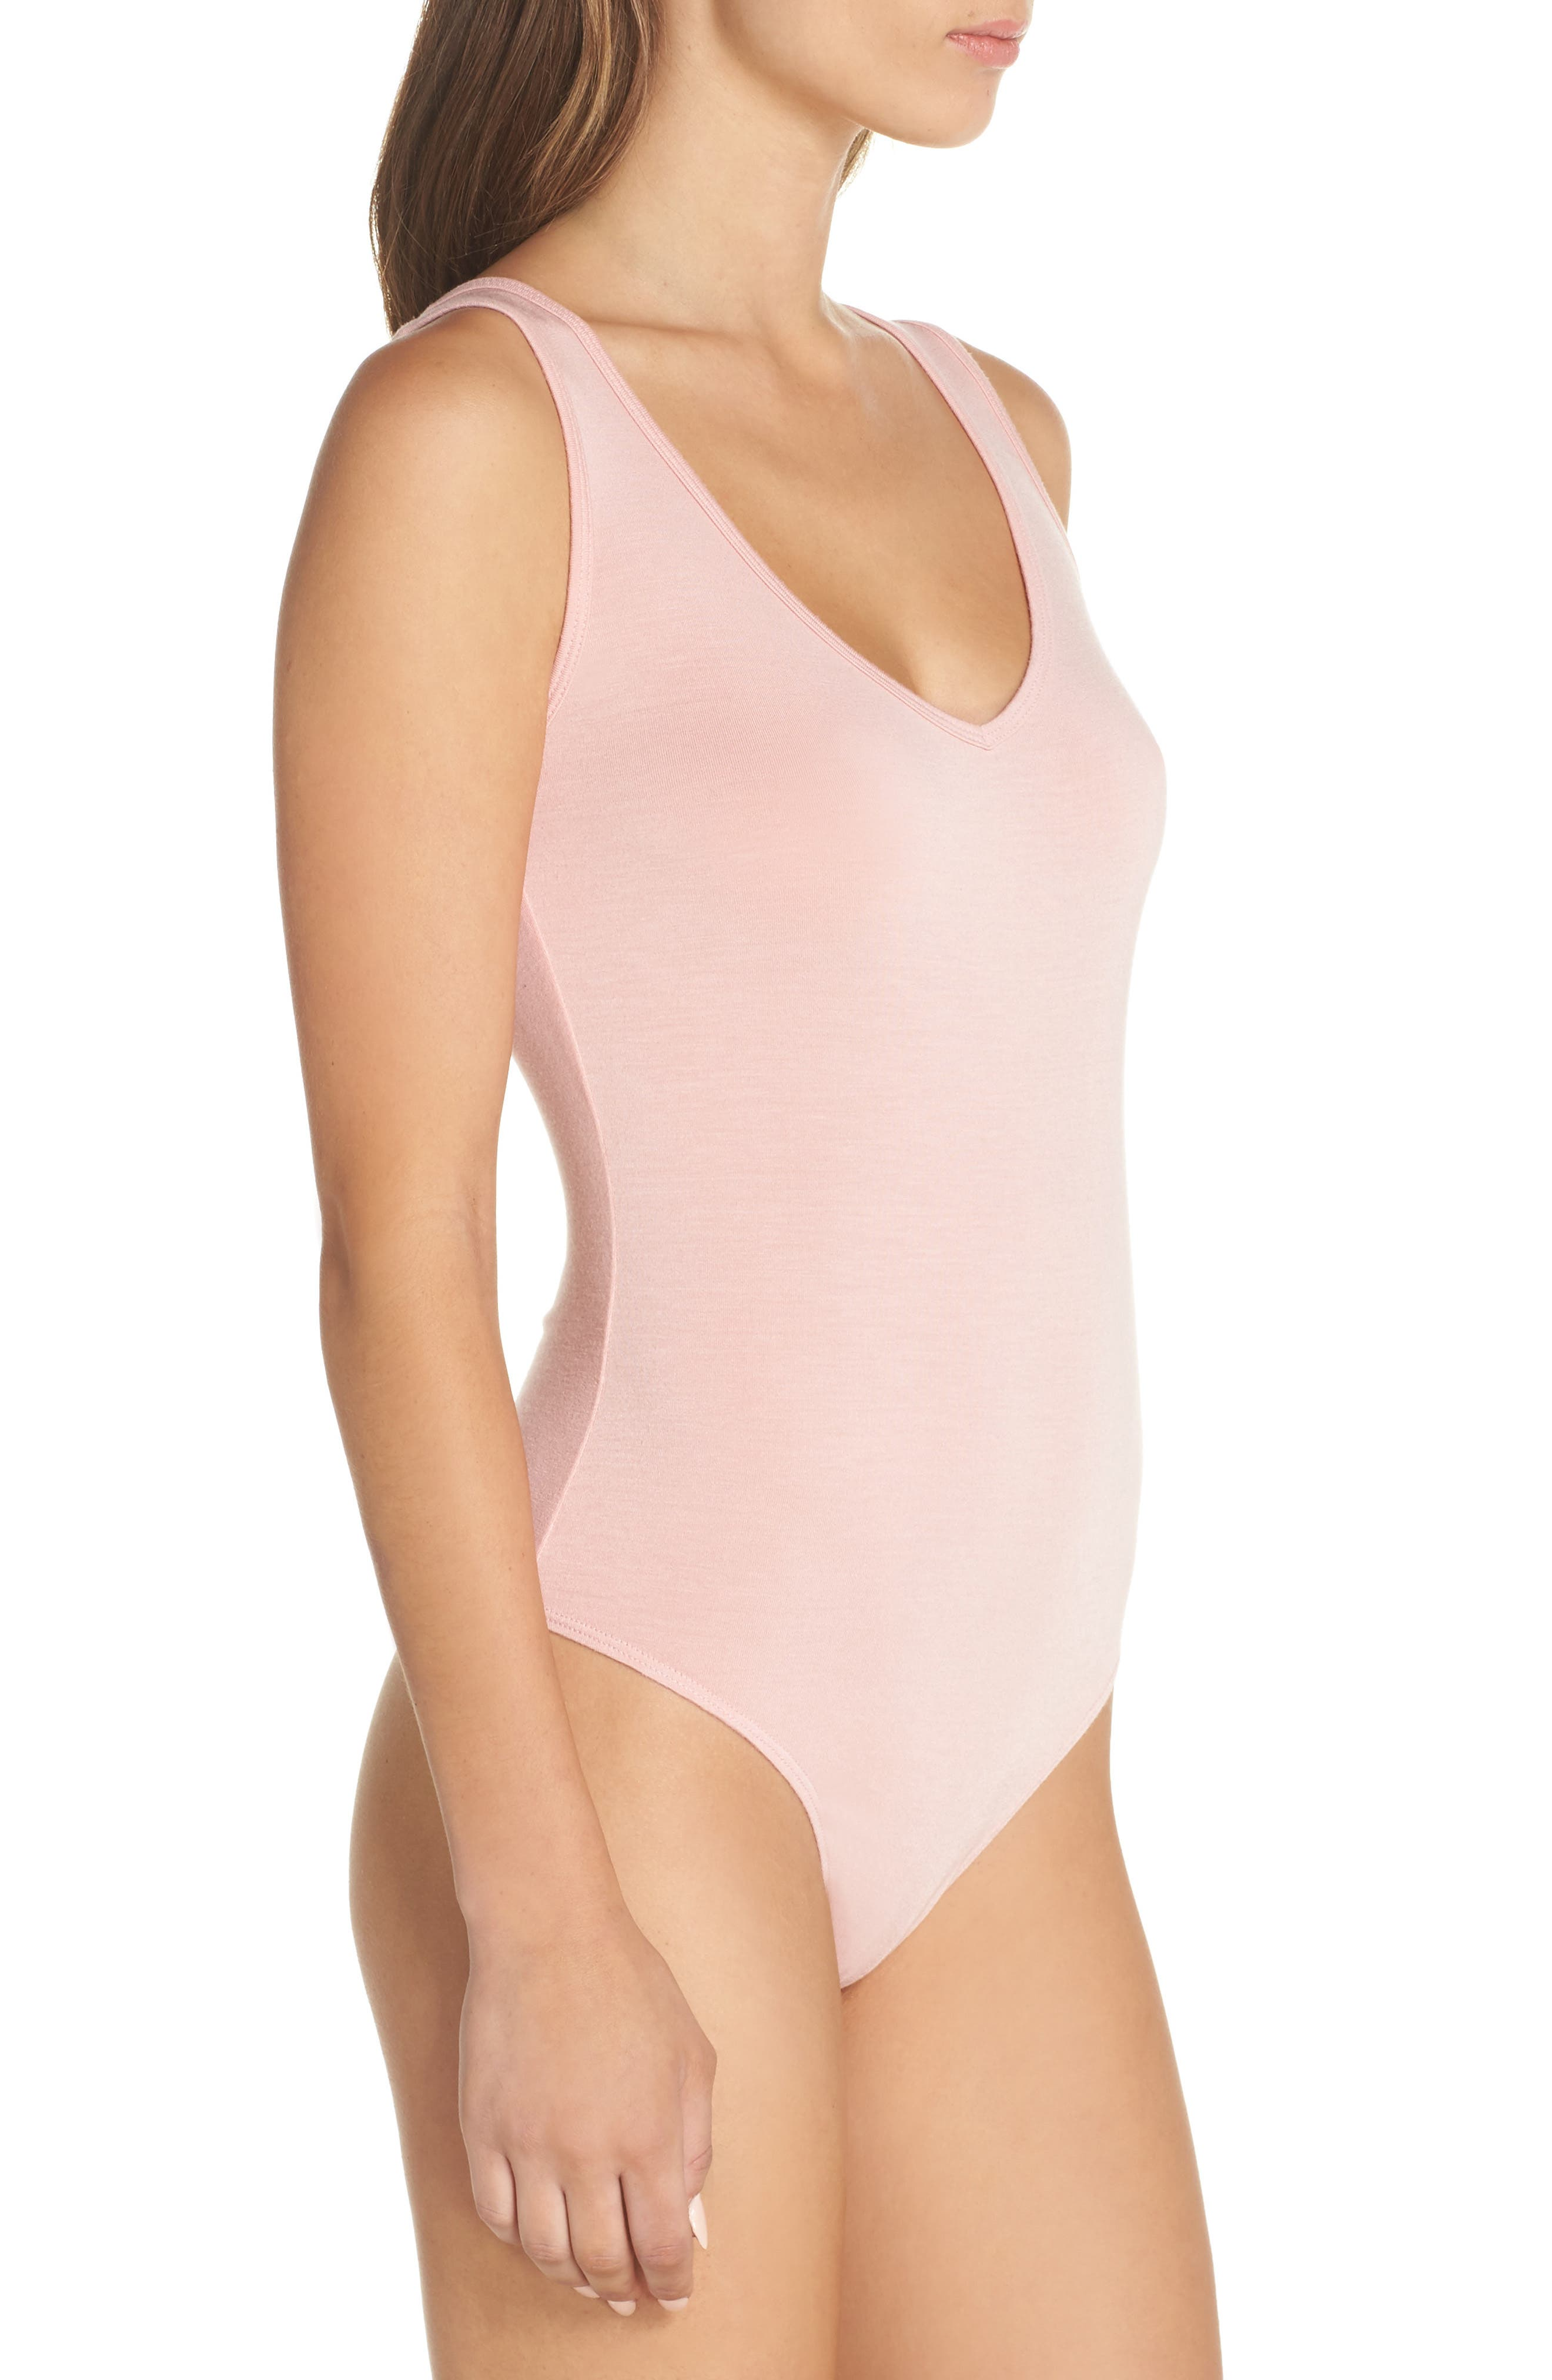 Jenny V-Neck Thong Bodysuit,                             Alternate thumbnail 3, color,                             Dream Pink